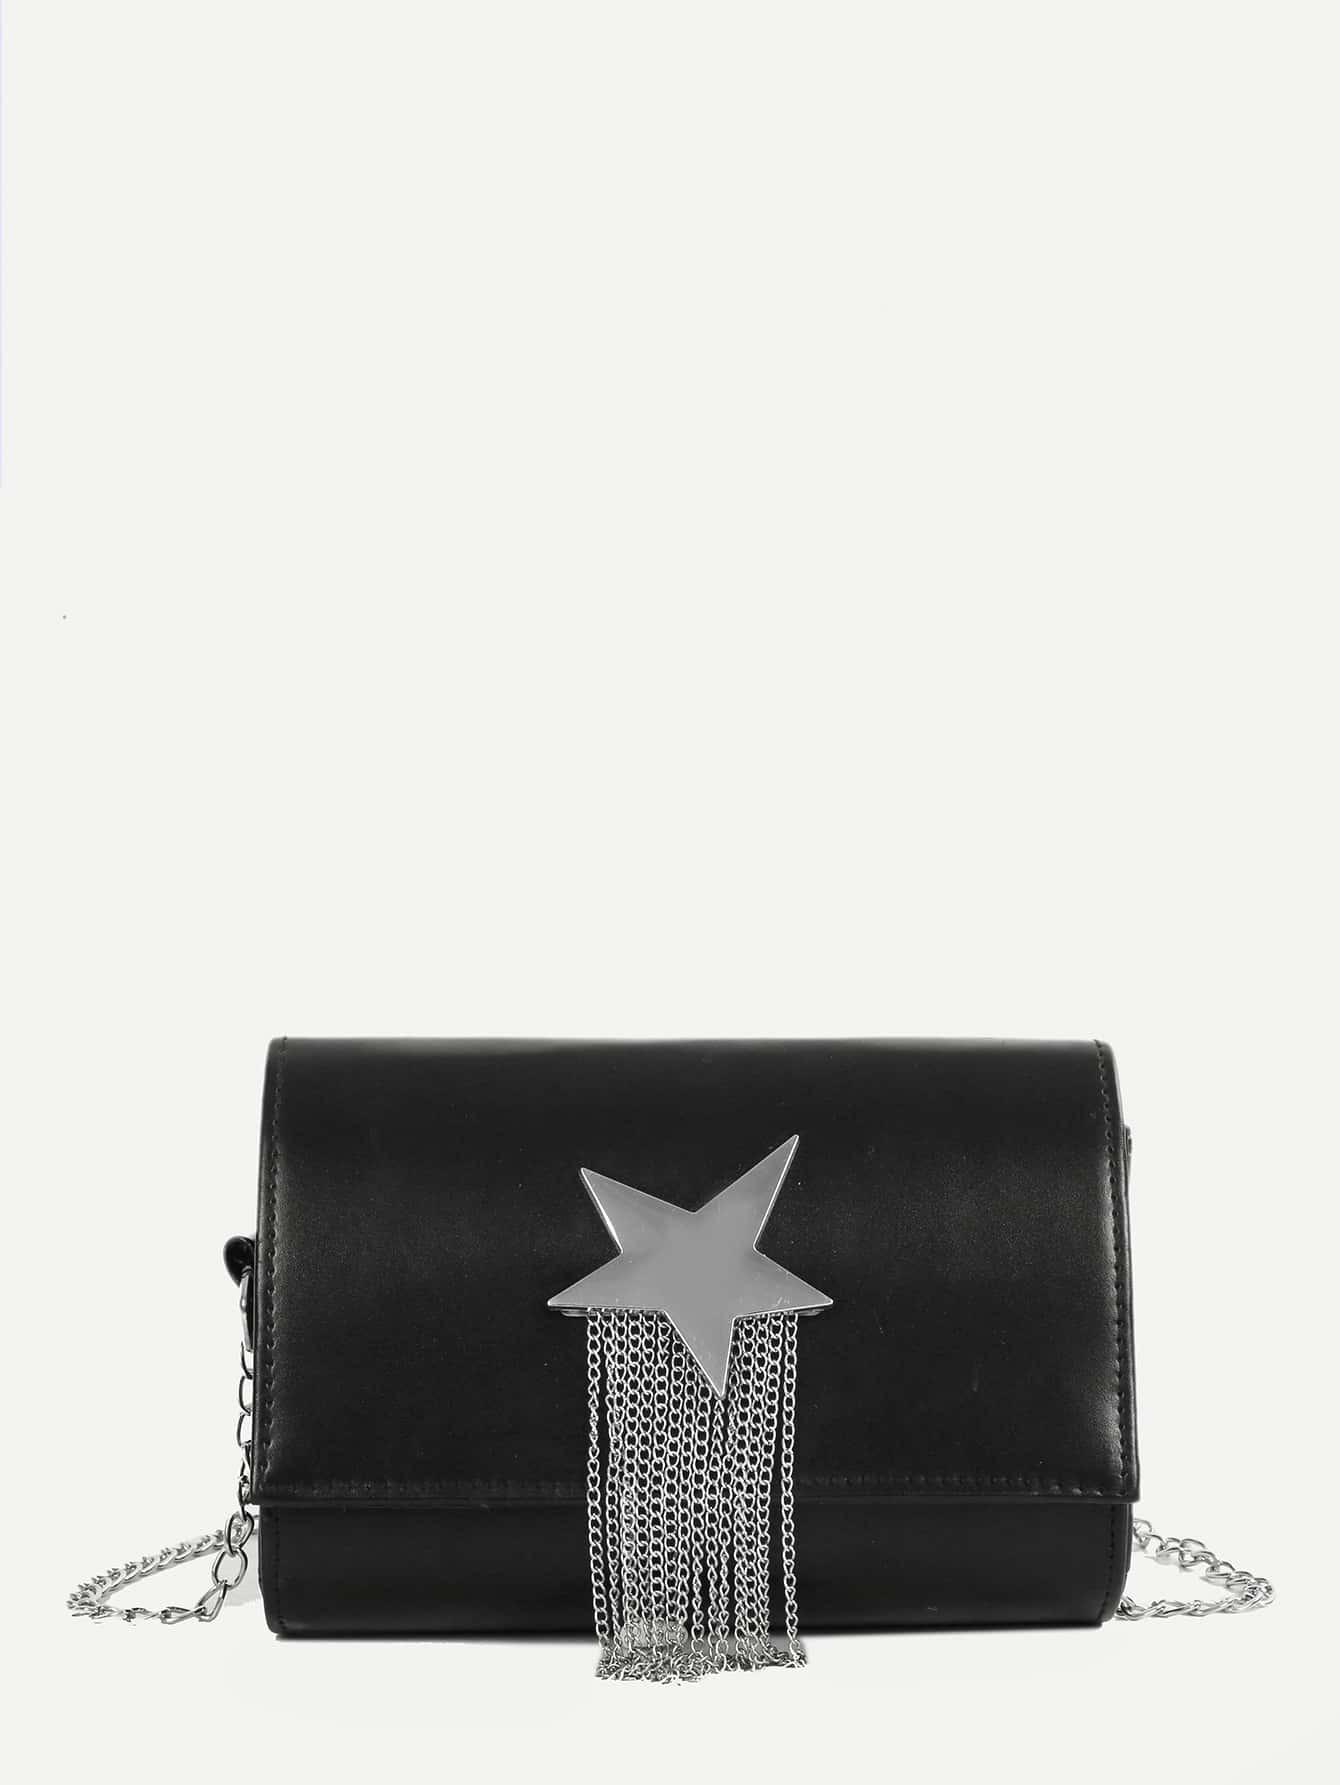 Star Detail Tassel Chain Bag 0 127mm standard stainless steel wire brush for metal anilox roller